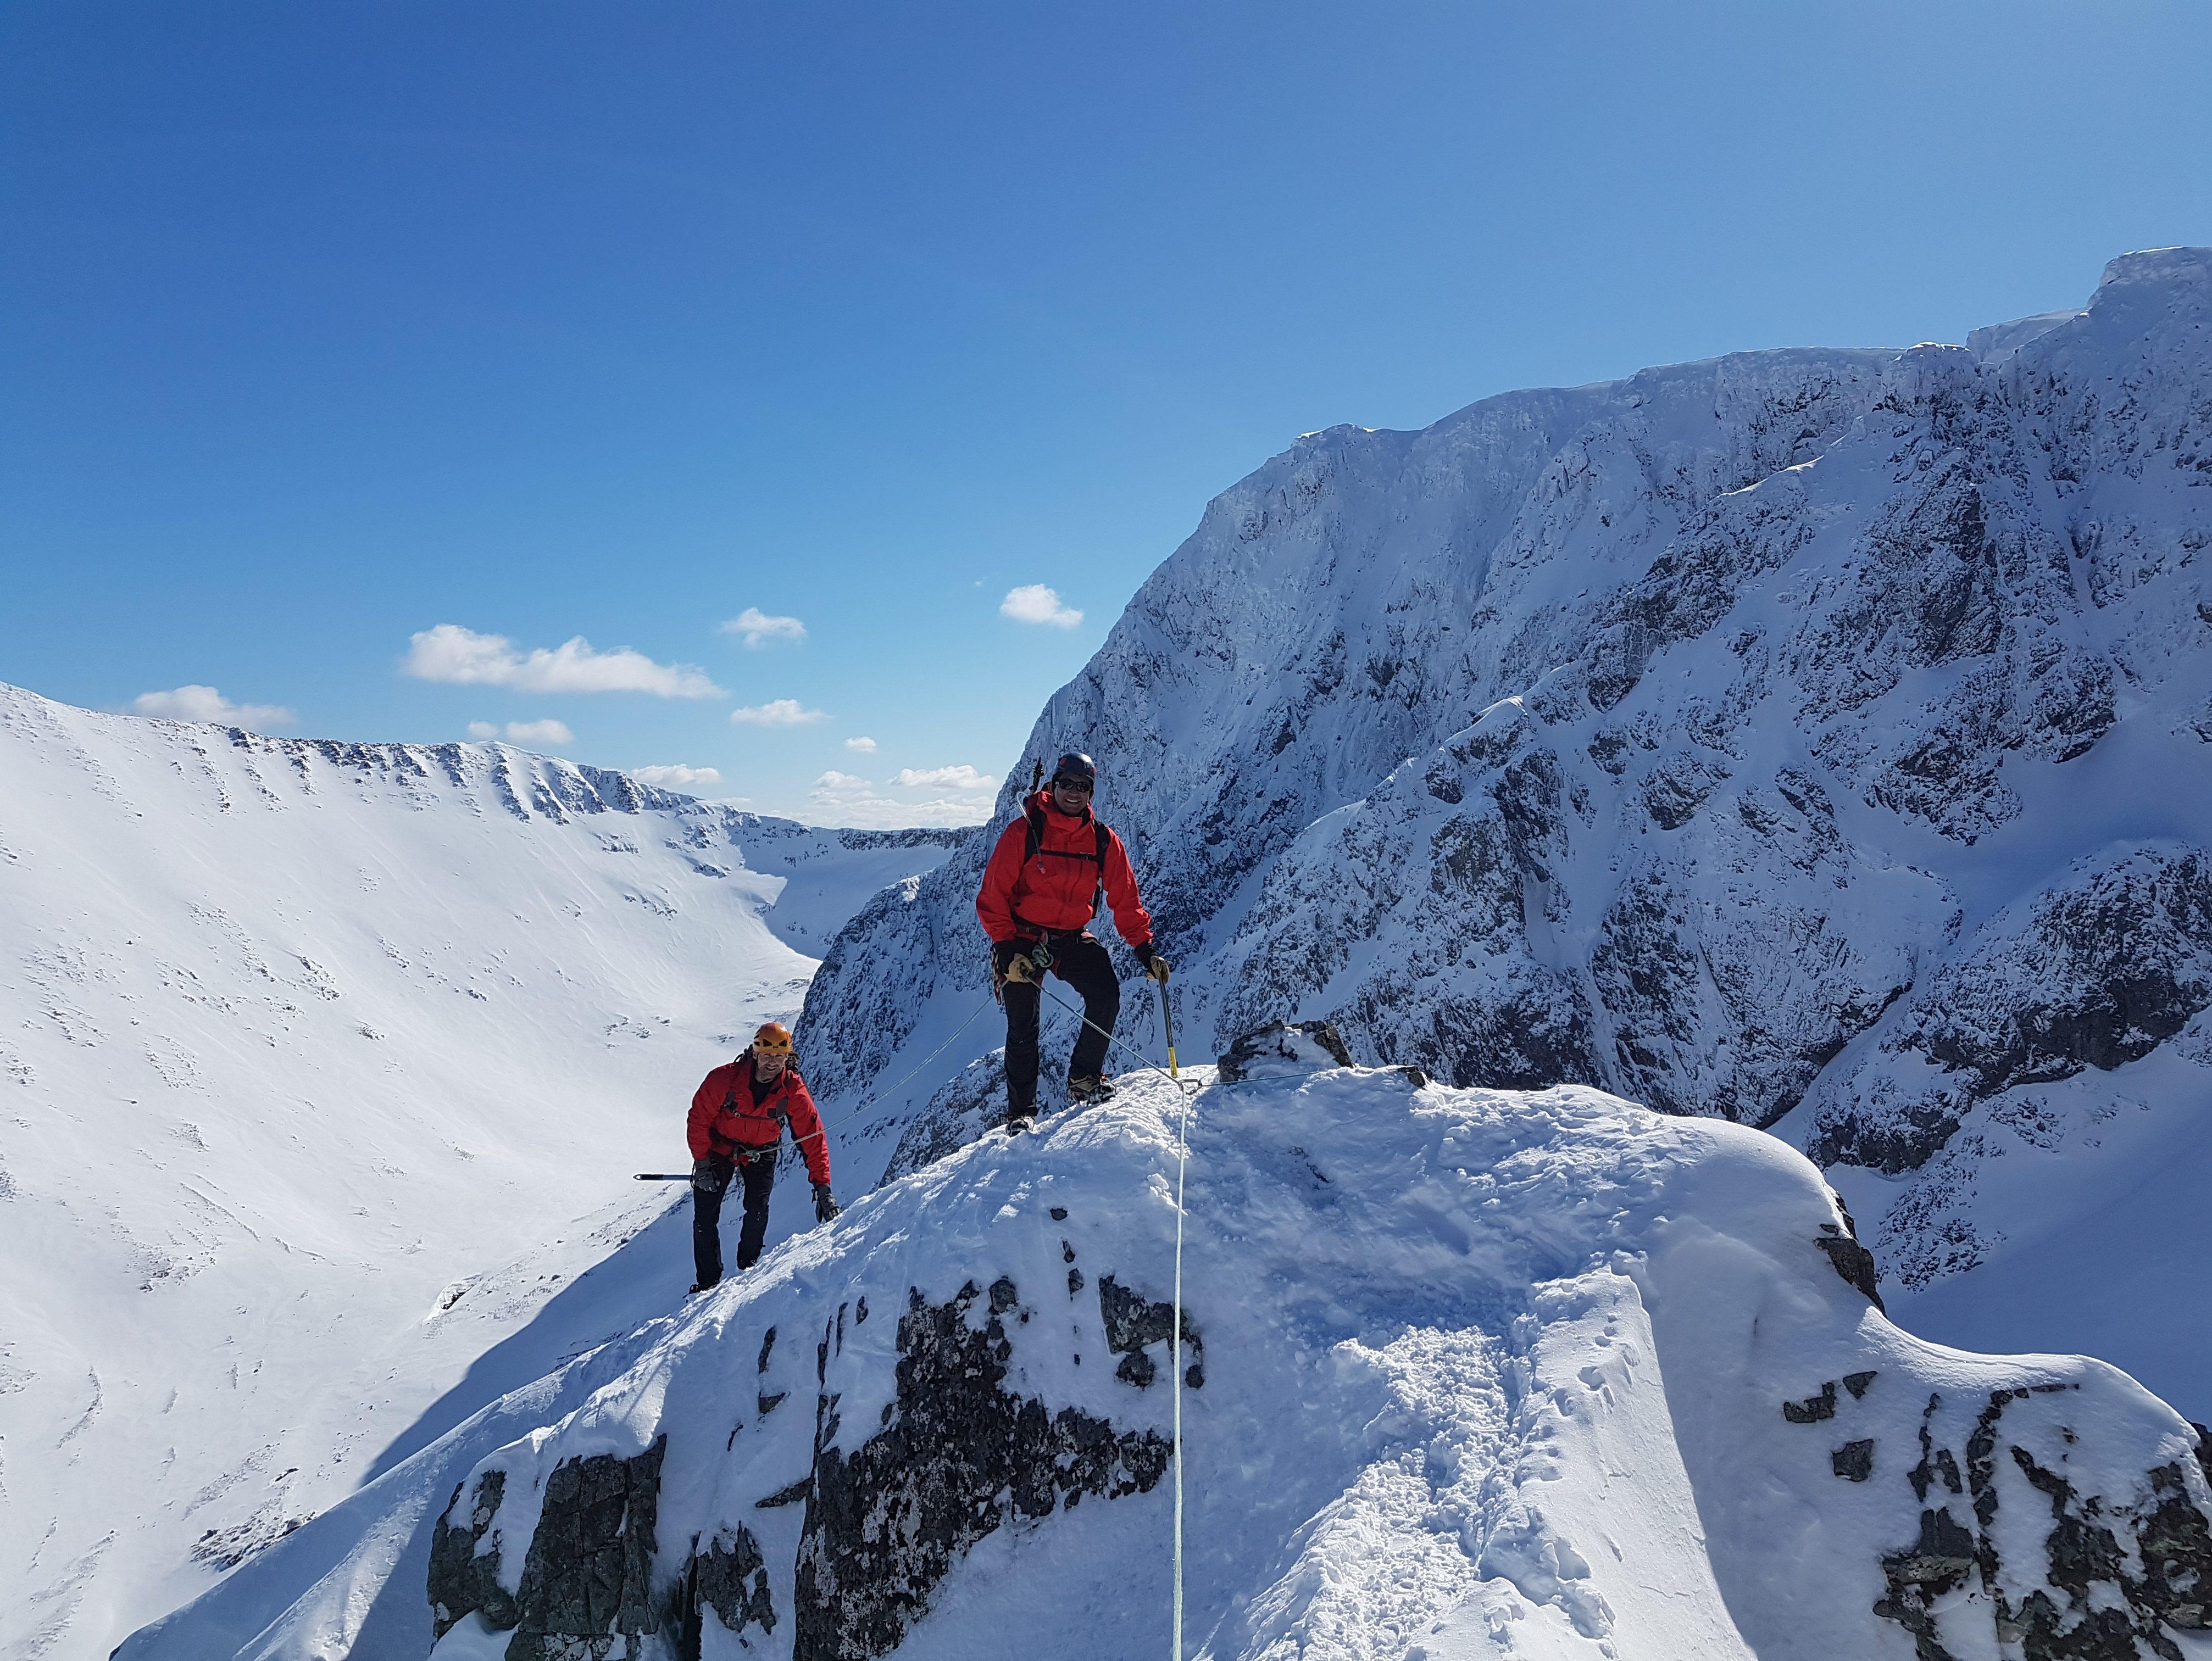 Scottish Winter Mountaineering Courses, Winter Mountaineering Courses in Scotland, Lochaber Guides Winter Mountaineering Courses